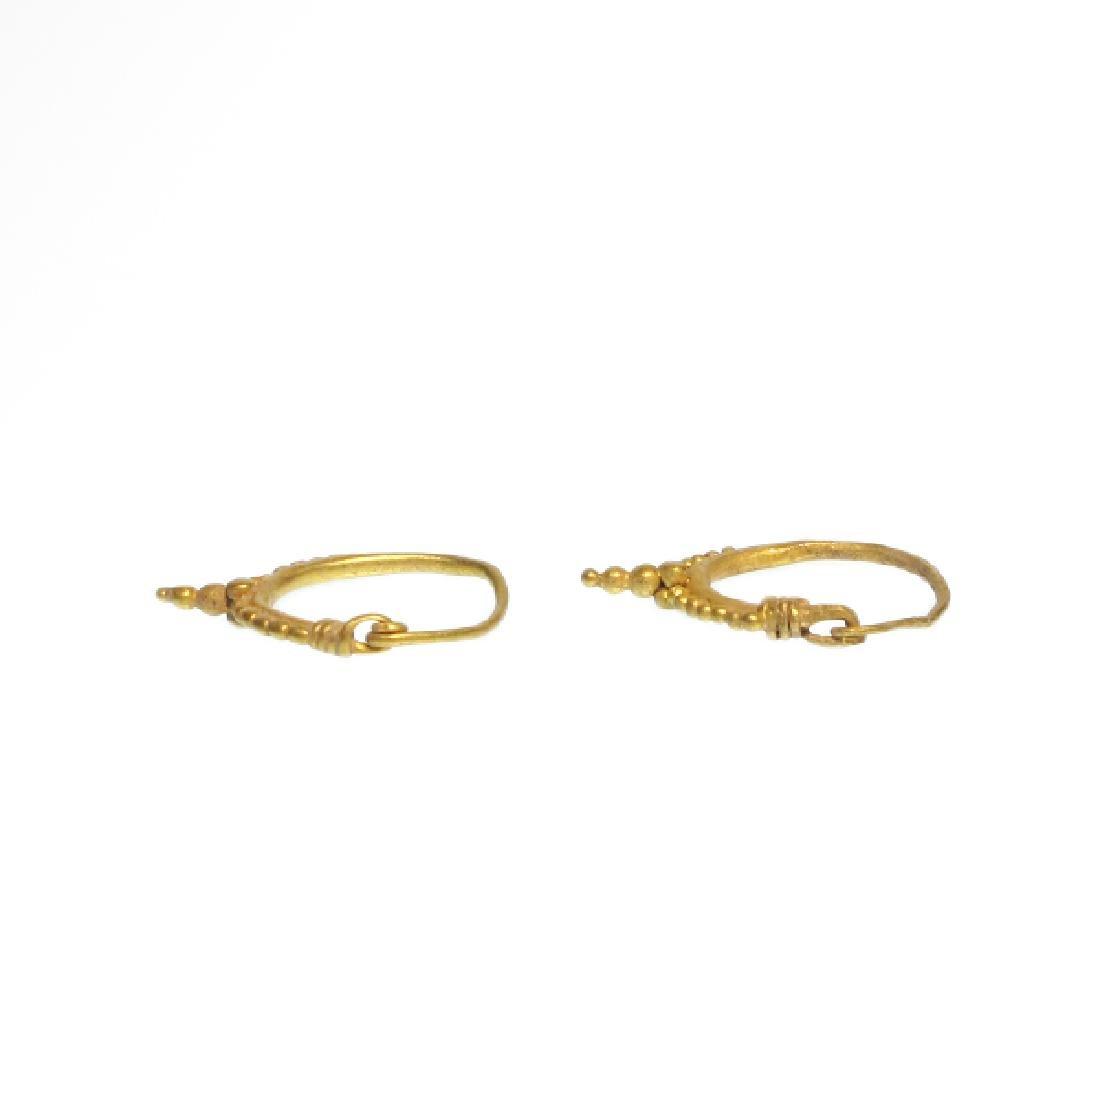 Roman Gold Hoop Earrings, c. 2nd-4th Century A.D. - 6